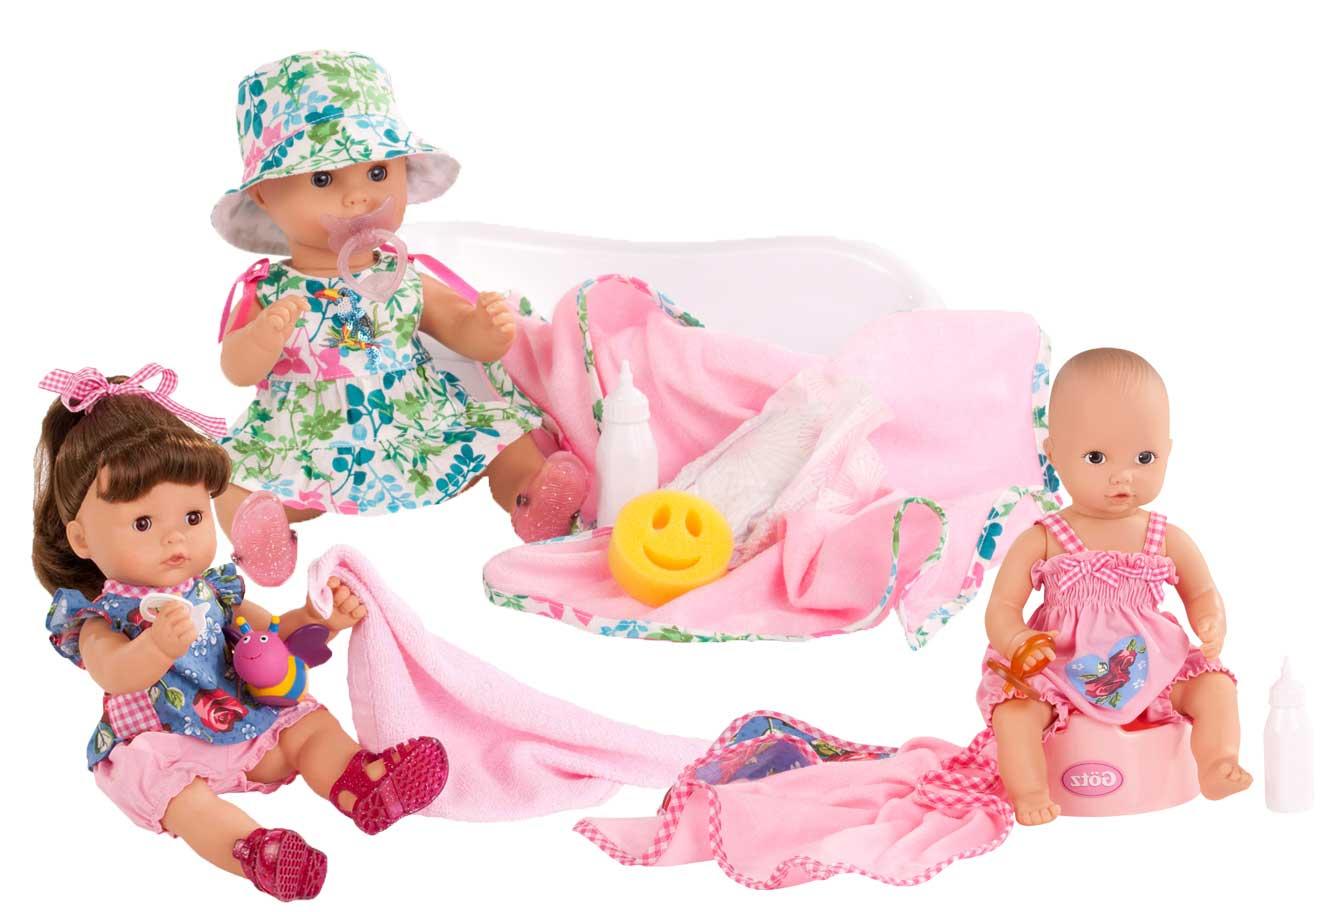 Aquini Bath Dolls, S, M